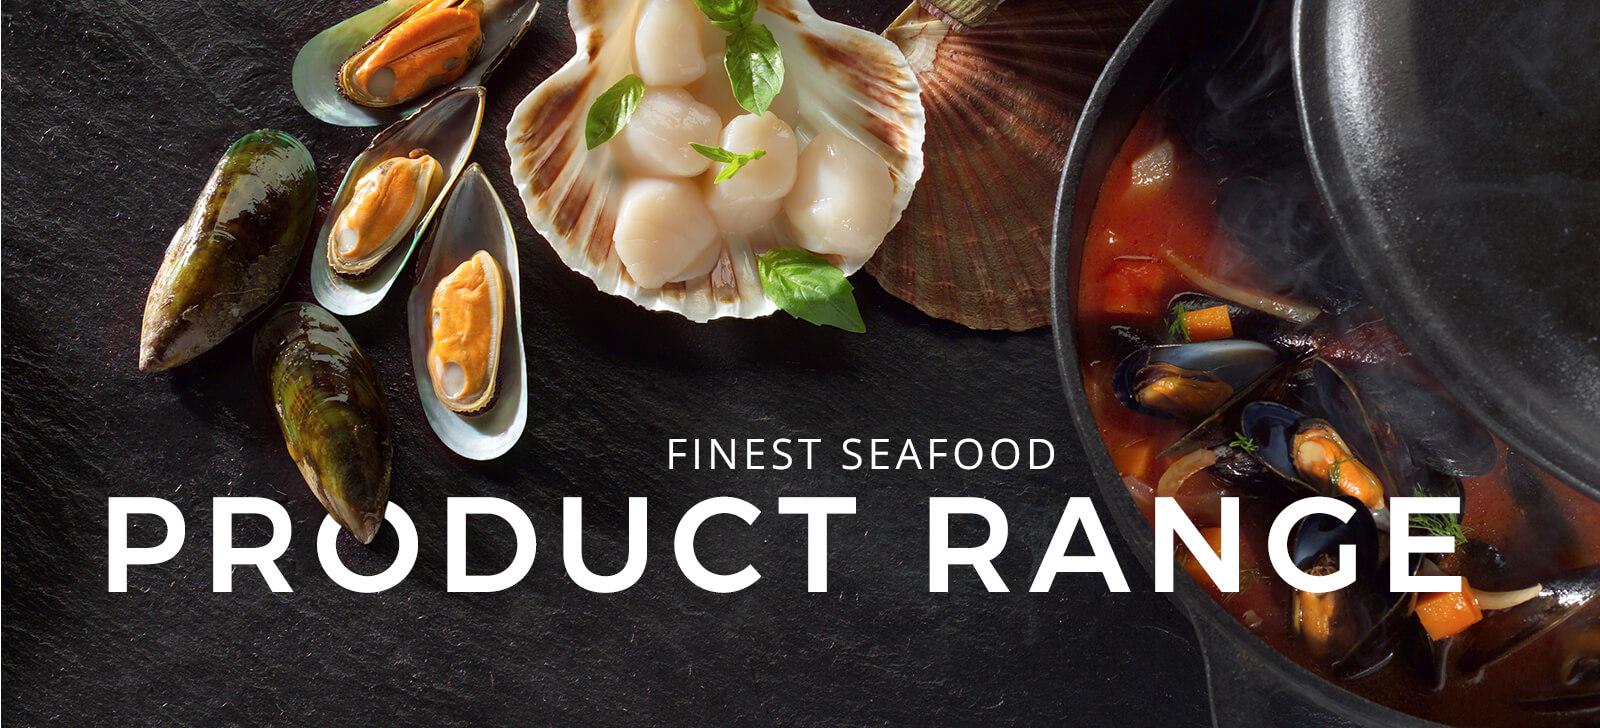 Finest Seafood - Product Range